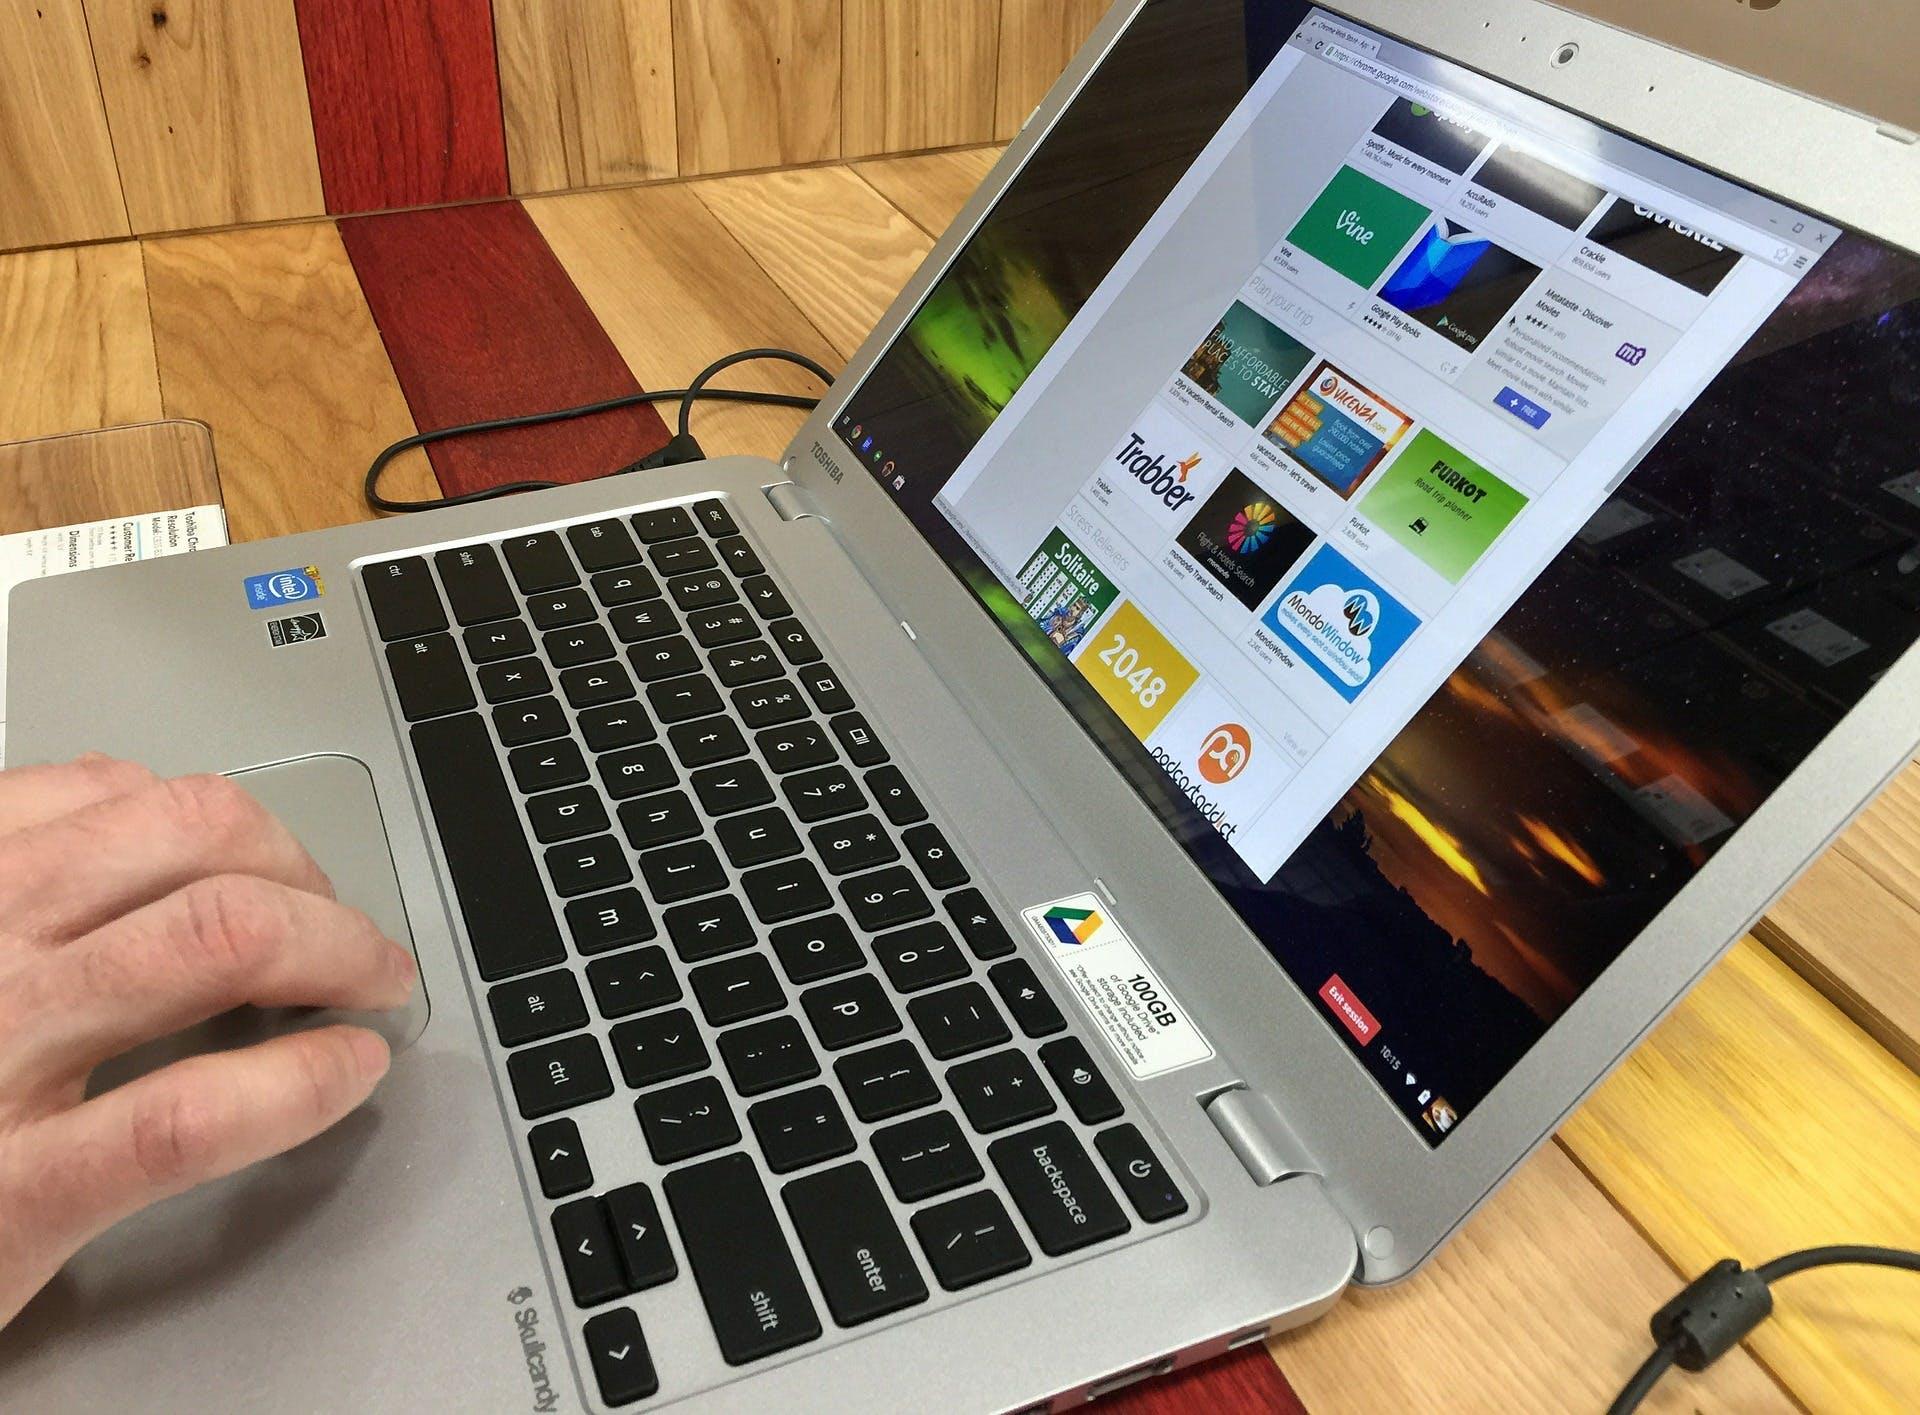 Best Laptop for Recording Videos